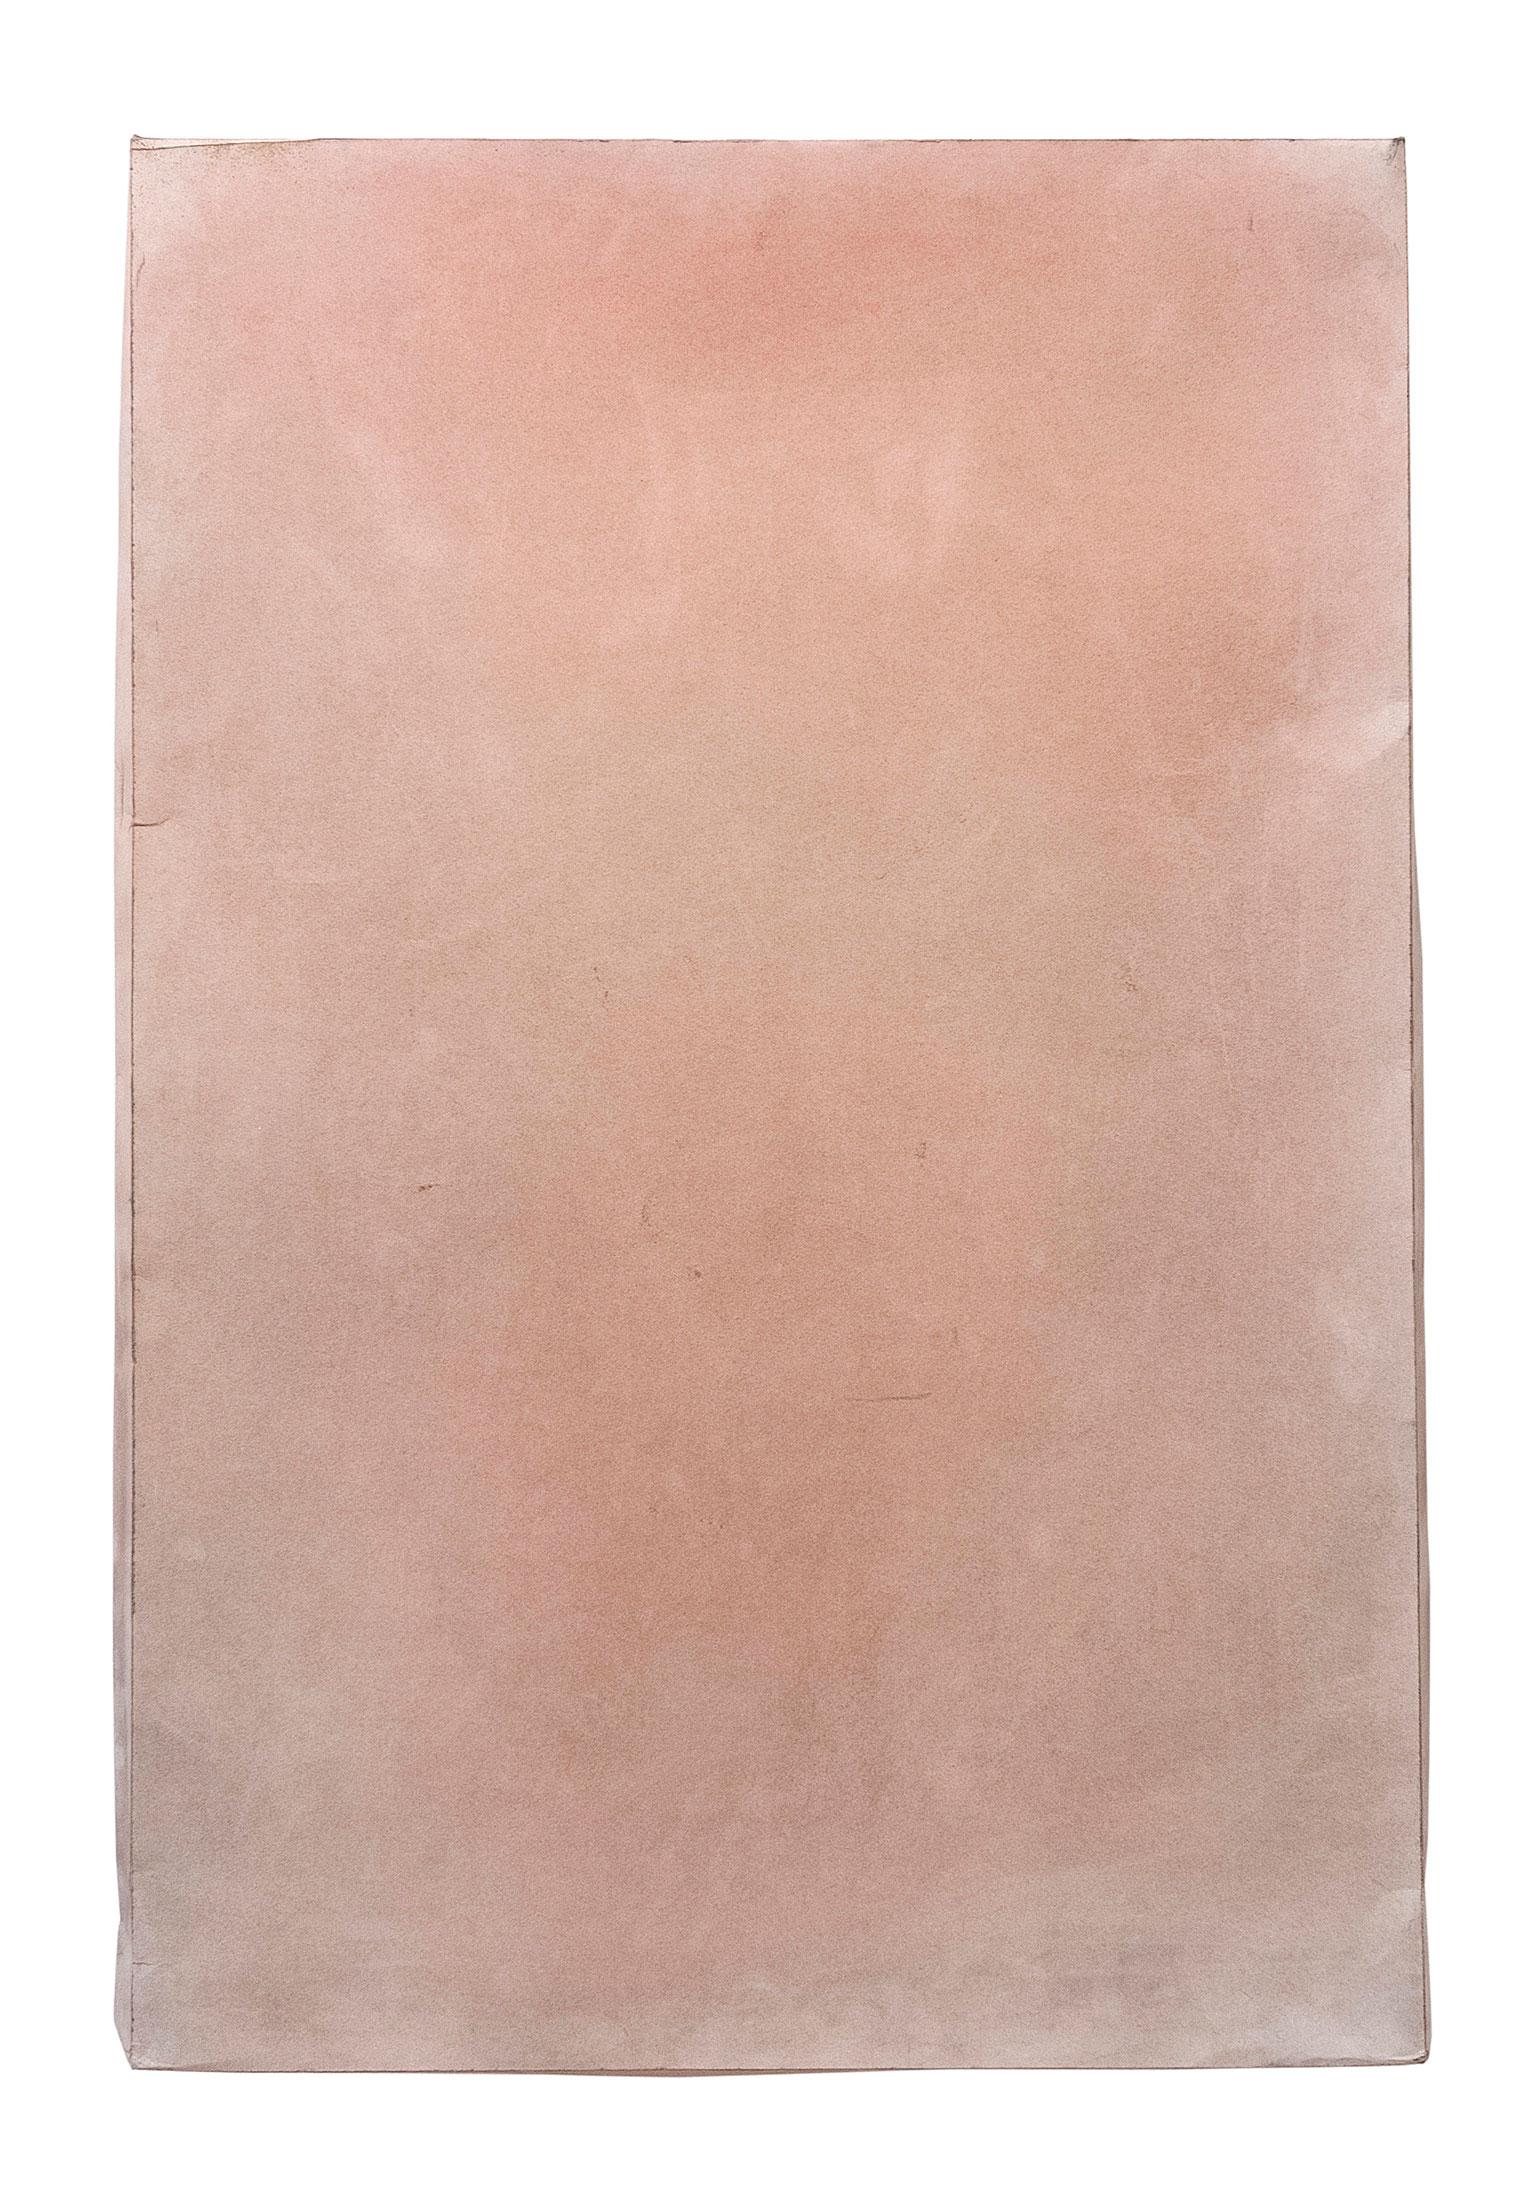 <b>Title:&nbsp;</b>Wrap<br /><b>Year:&nbsp;</b>2012<br /><b>Medium:&nbsp;</b>Charcoal and chalk on paper<br /><b>Size:&nbsp;</b>78 x 53 cm